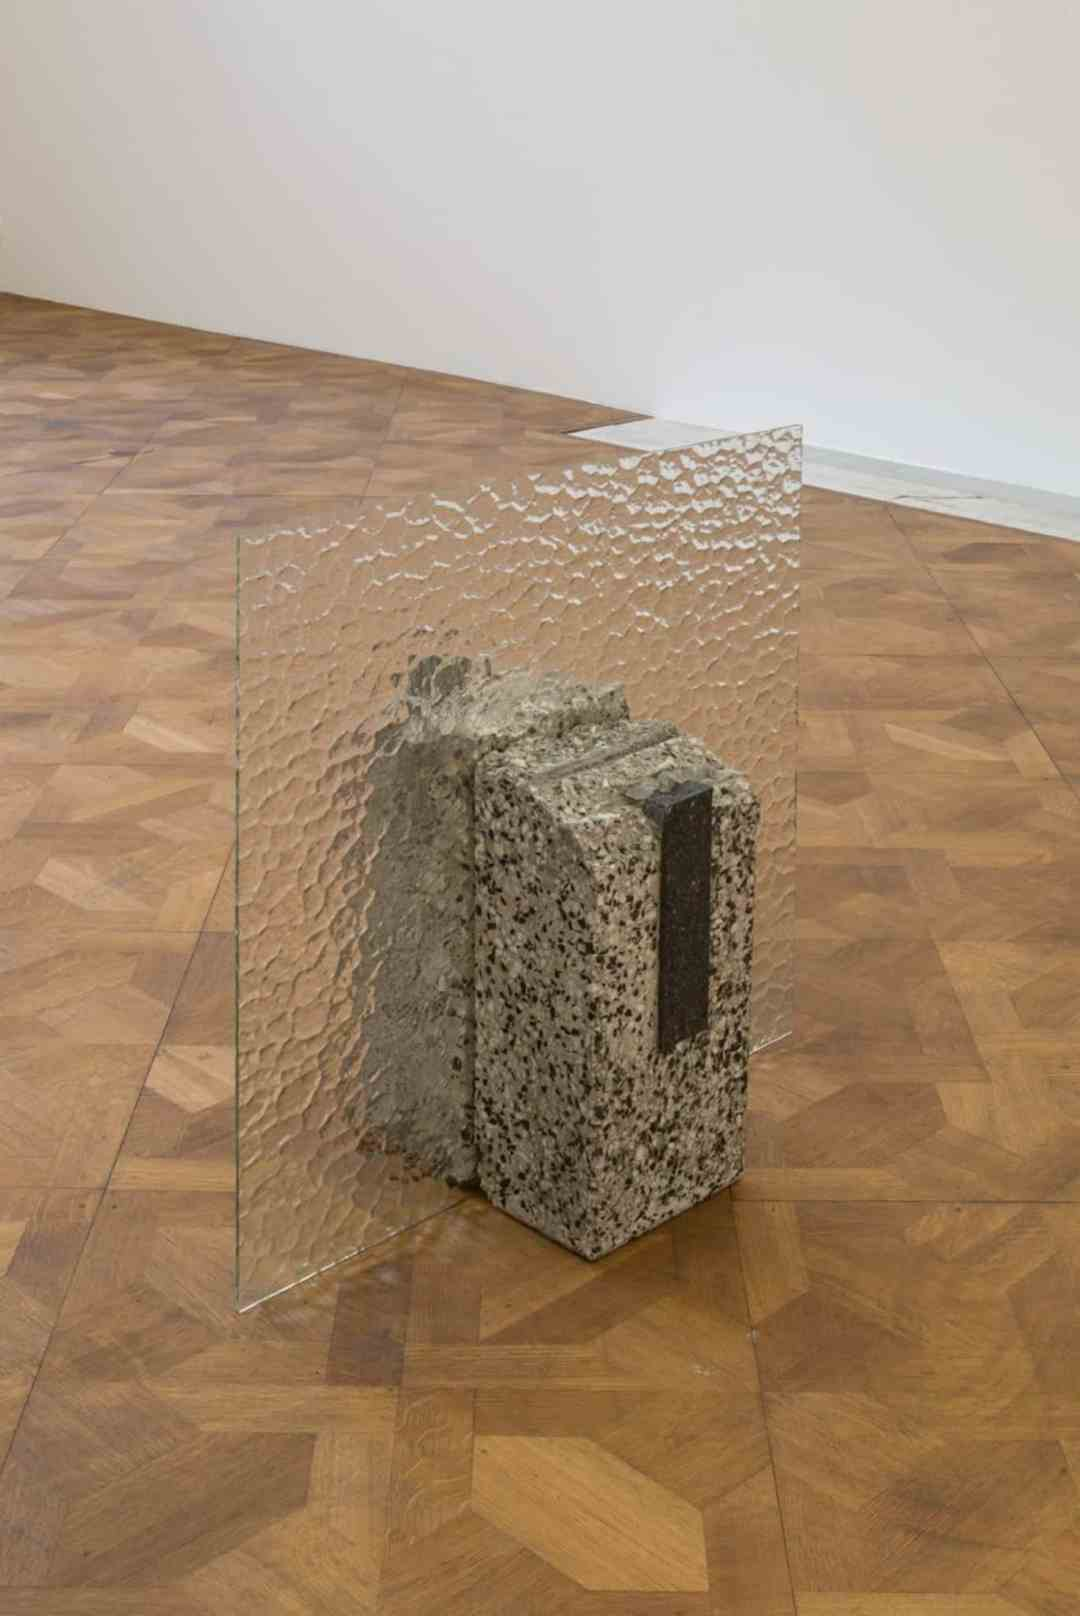 Mirosław Bałka, 60 x 60 x 27, 2018, 60x60x27, Dvir Gallery